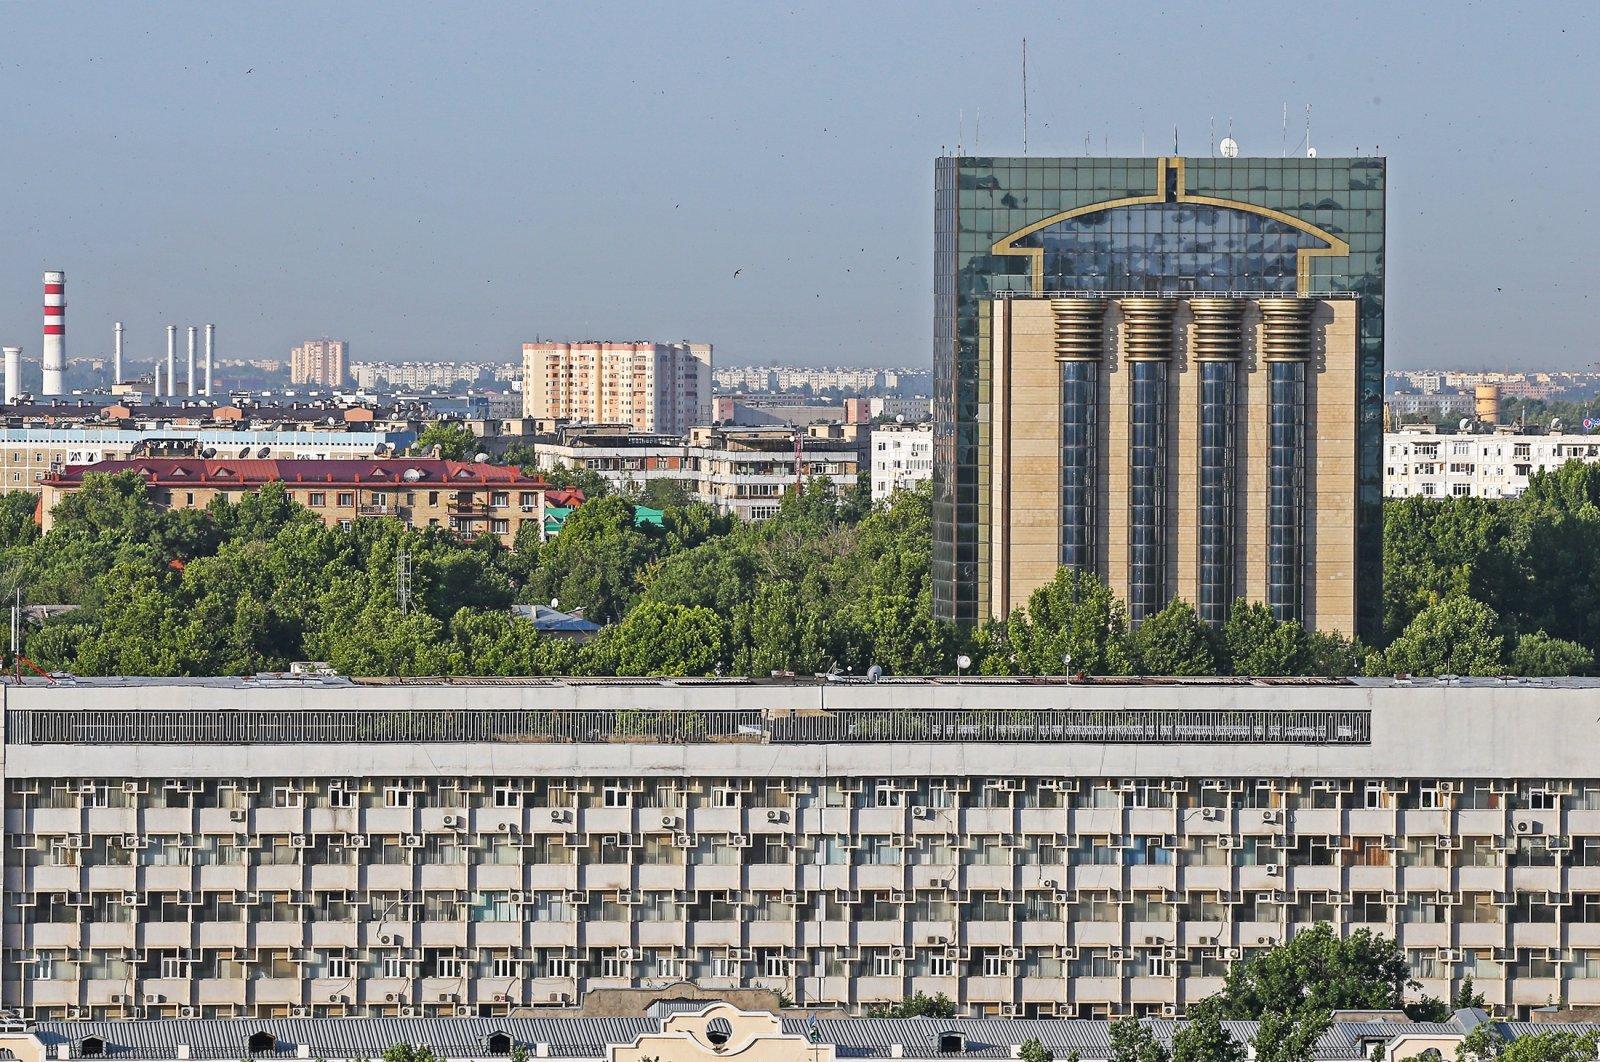 A view of the Central Bank of Uzbekistan building, in Tashkent, Uzbekistan, June 19, 2017. (Getty Images Photo)